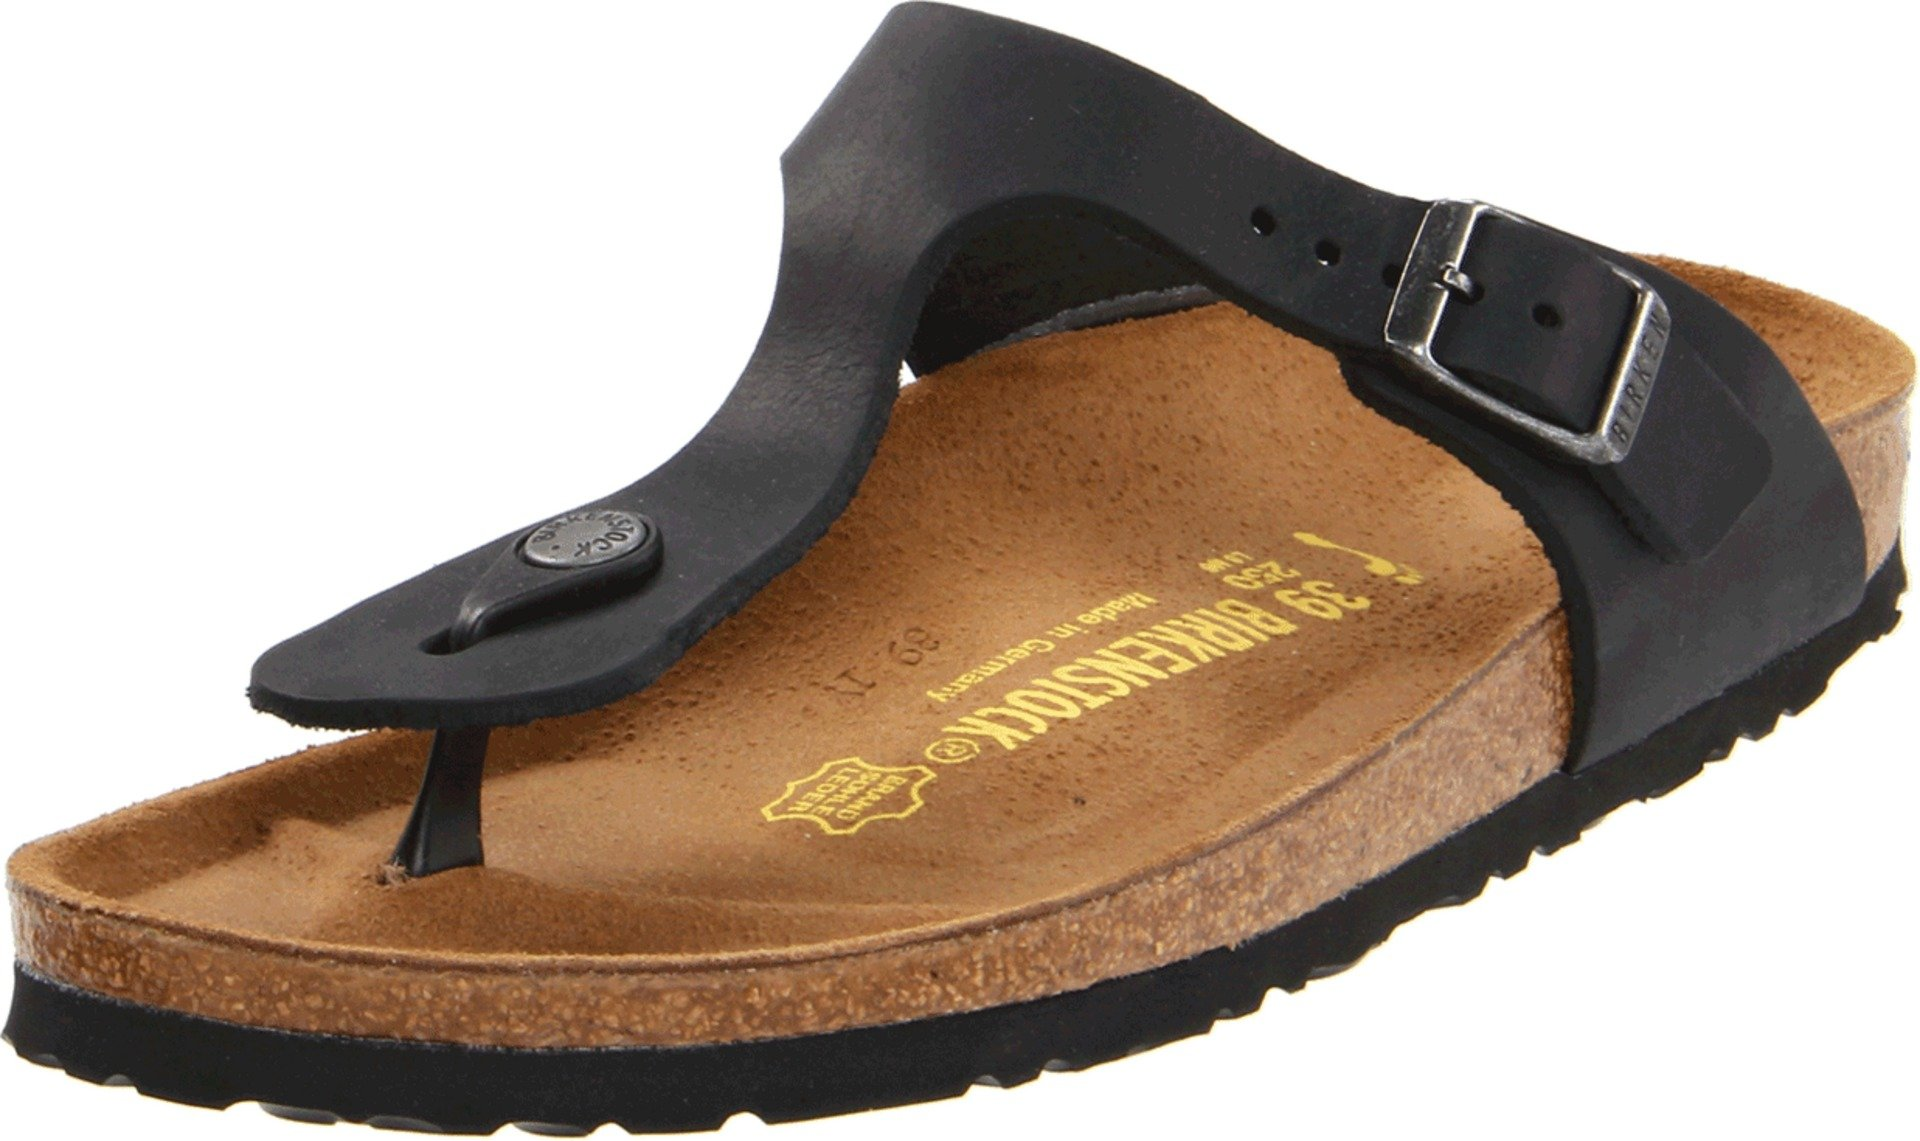 Birkenstock Women's GIzeh Thong Sandal, Black Oiled, 40 M EU/9-9.5 B(M) US